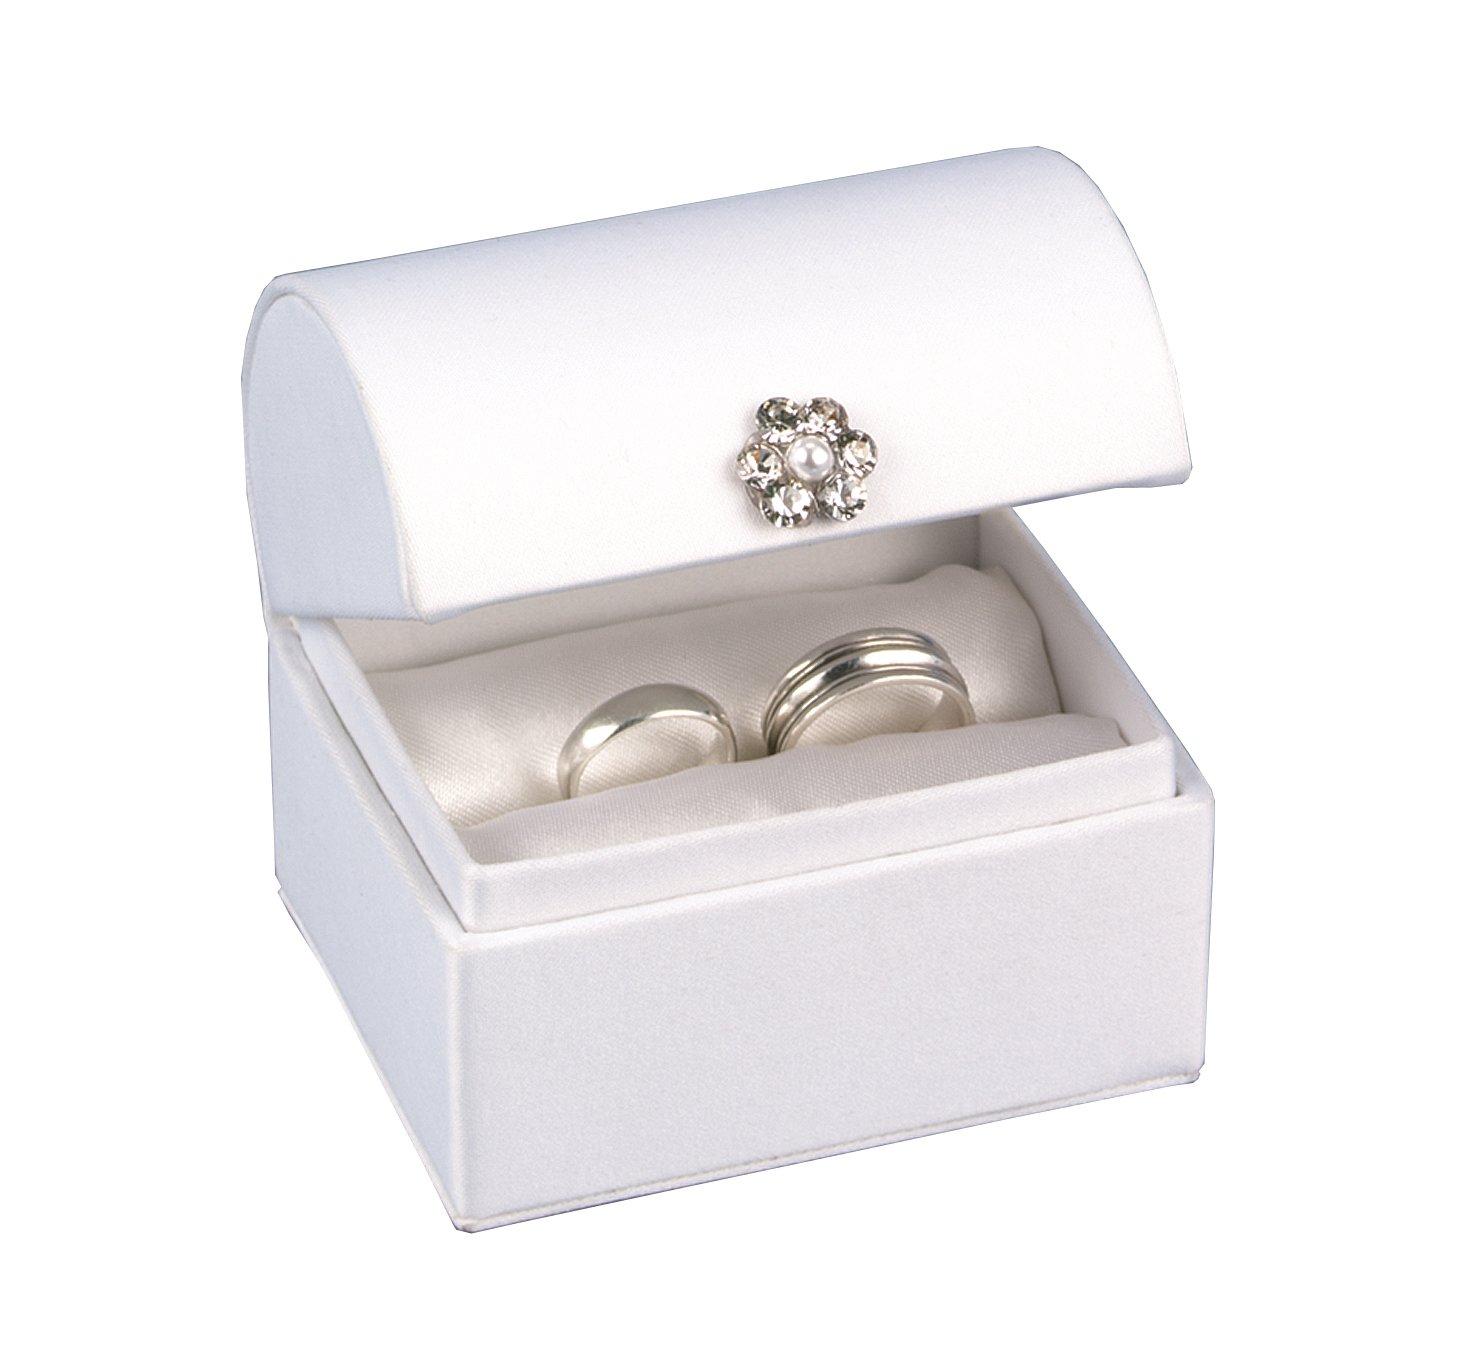 amazon com hortense b hewitt wedding accessories white satin